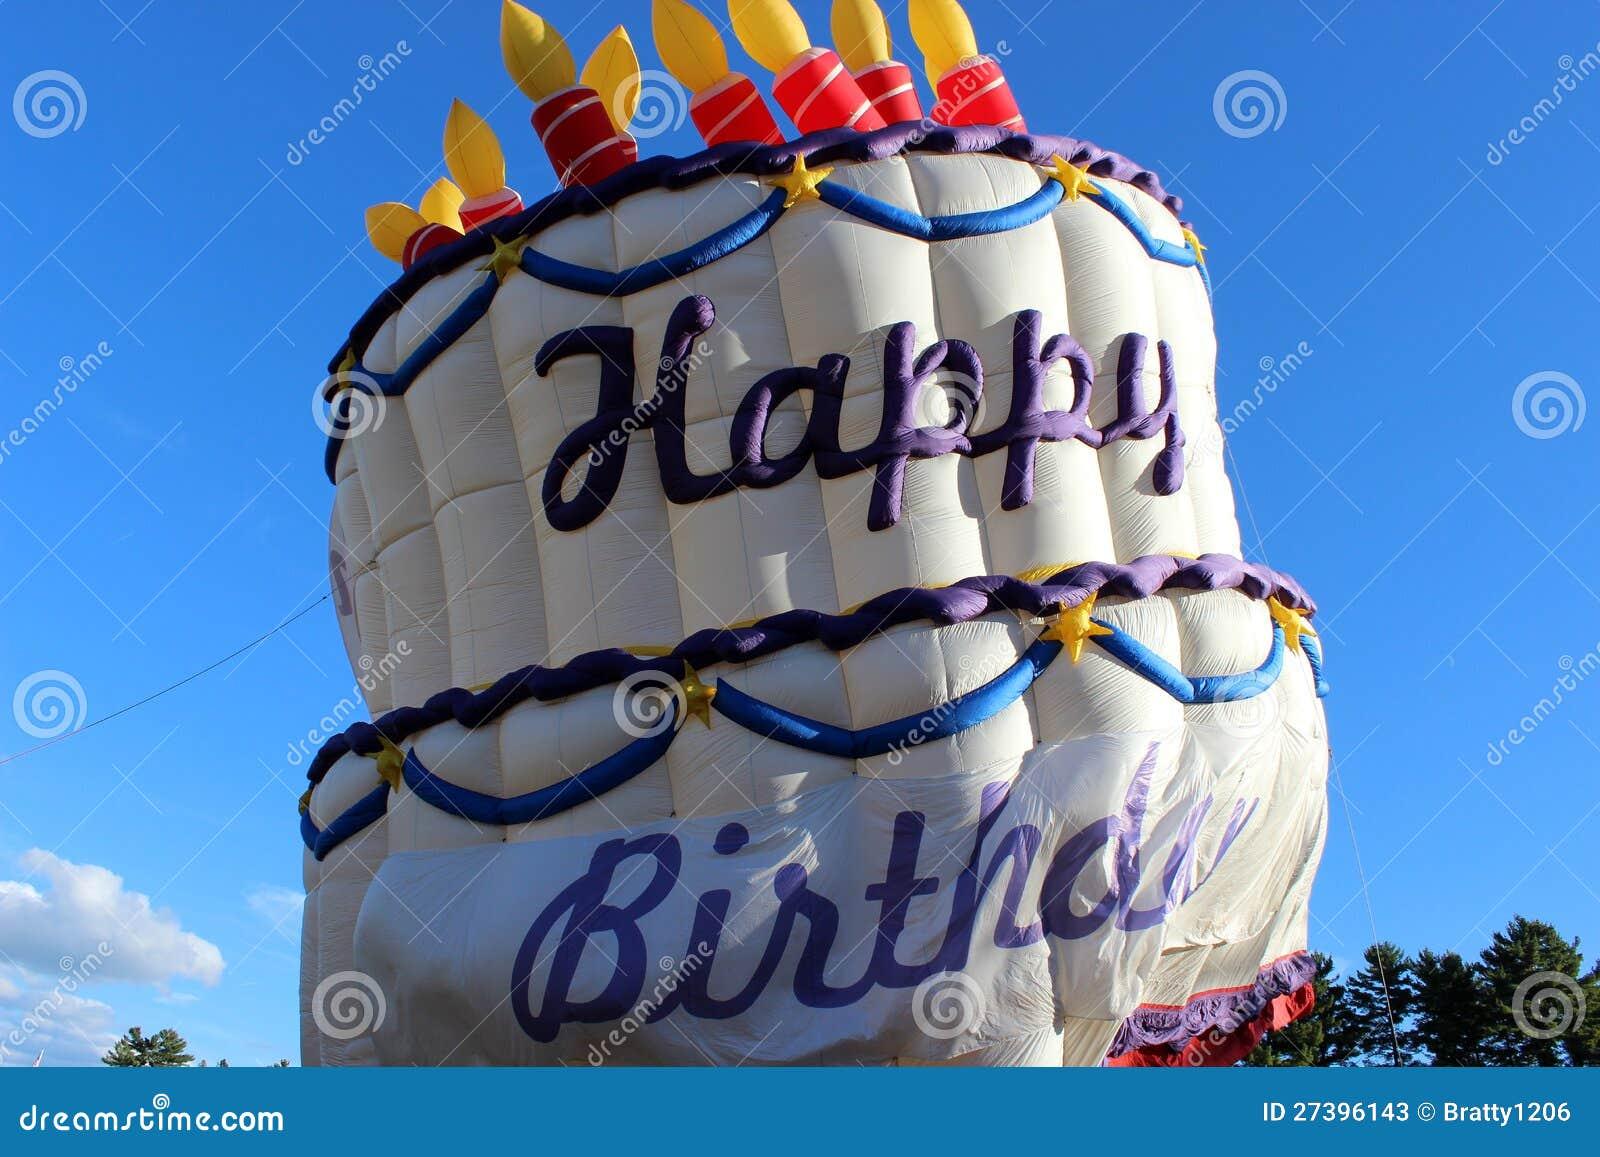 Hot Air Balloon Saying Happy Birthday Stock Image Image